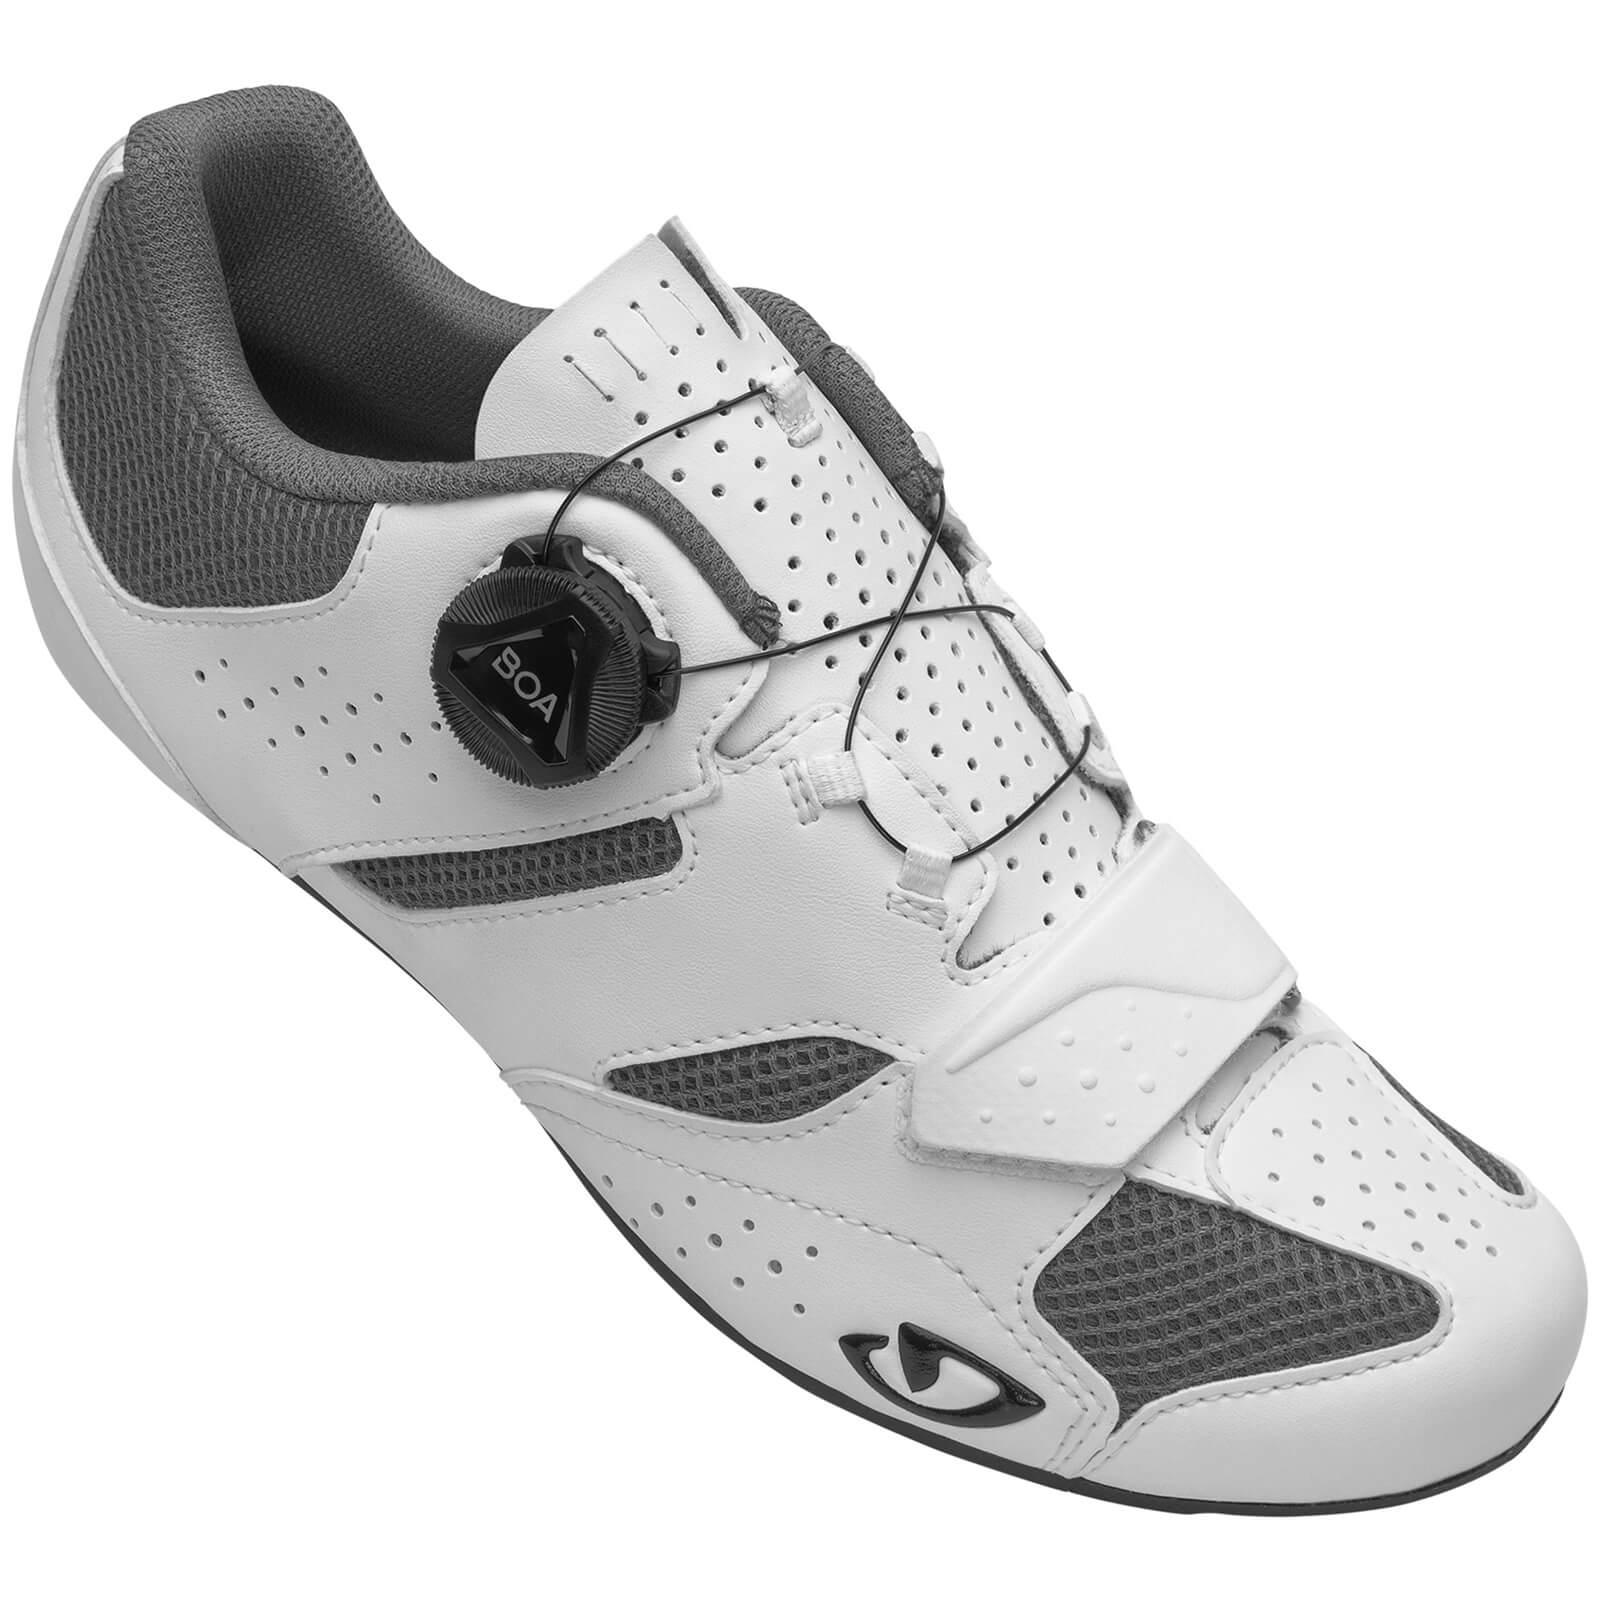 Giro Women's Savix II Road Shoe - EU 36 - White